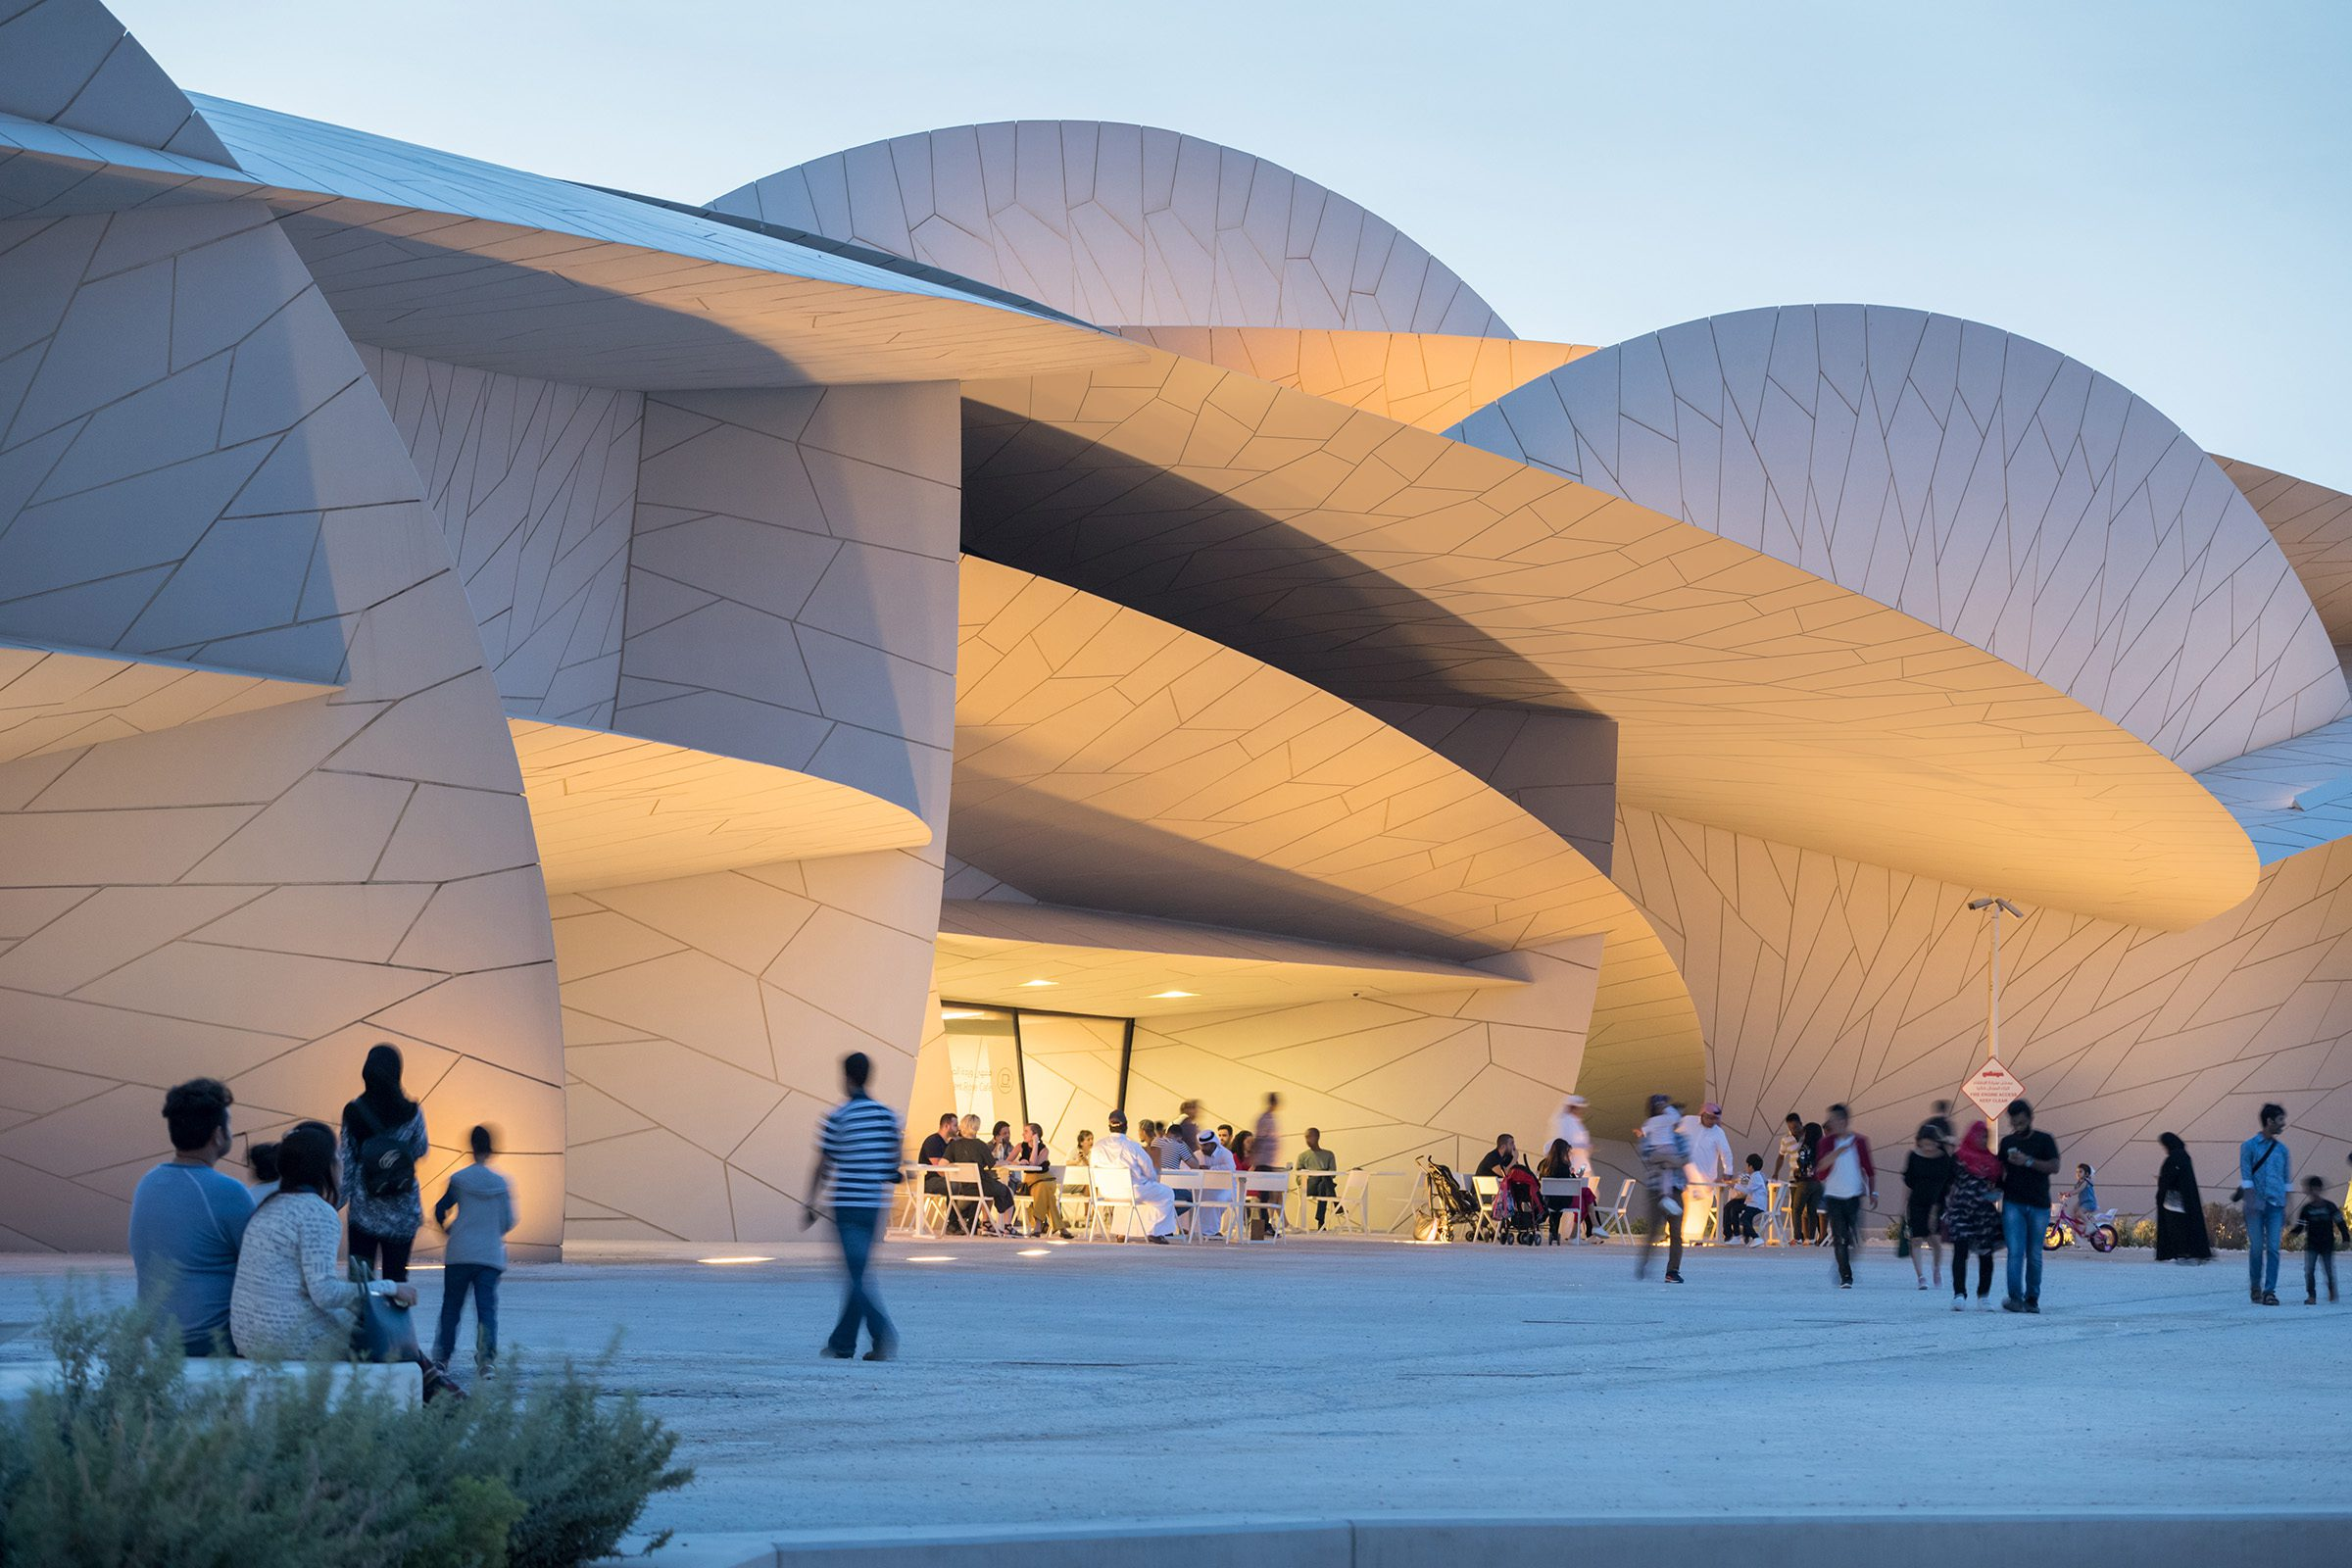 National Museum of Qatar Lighting Design